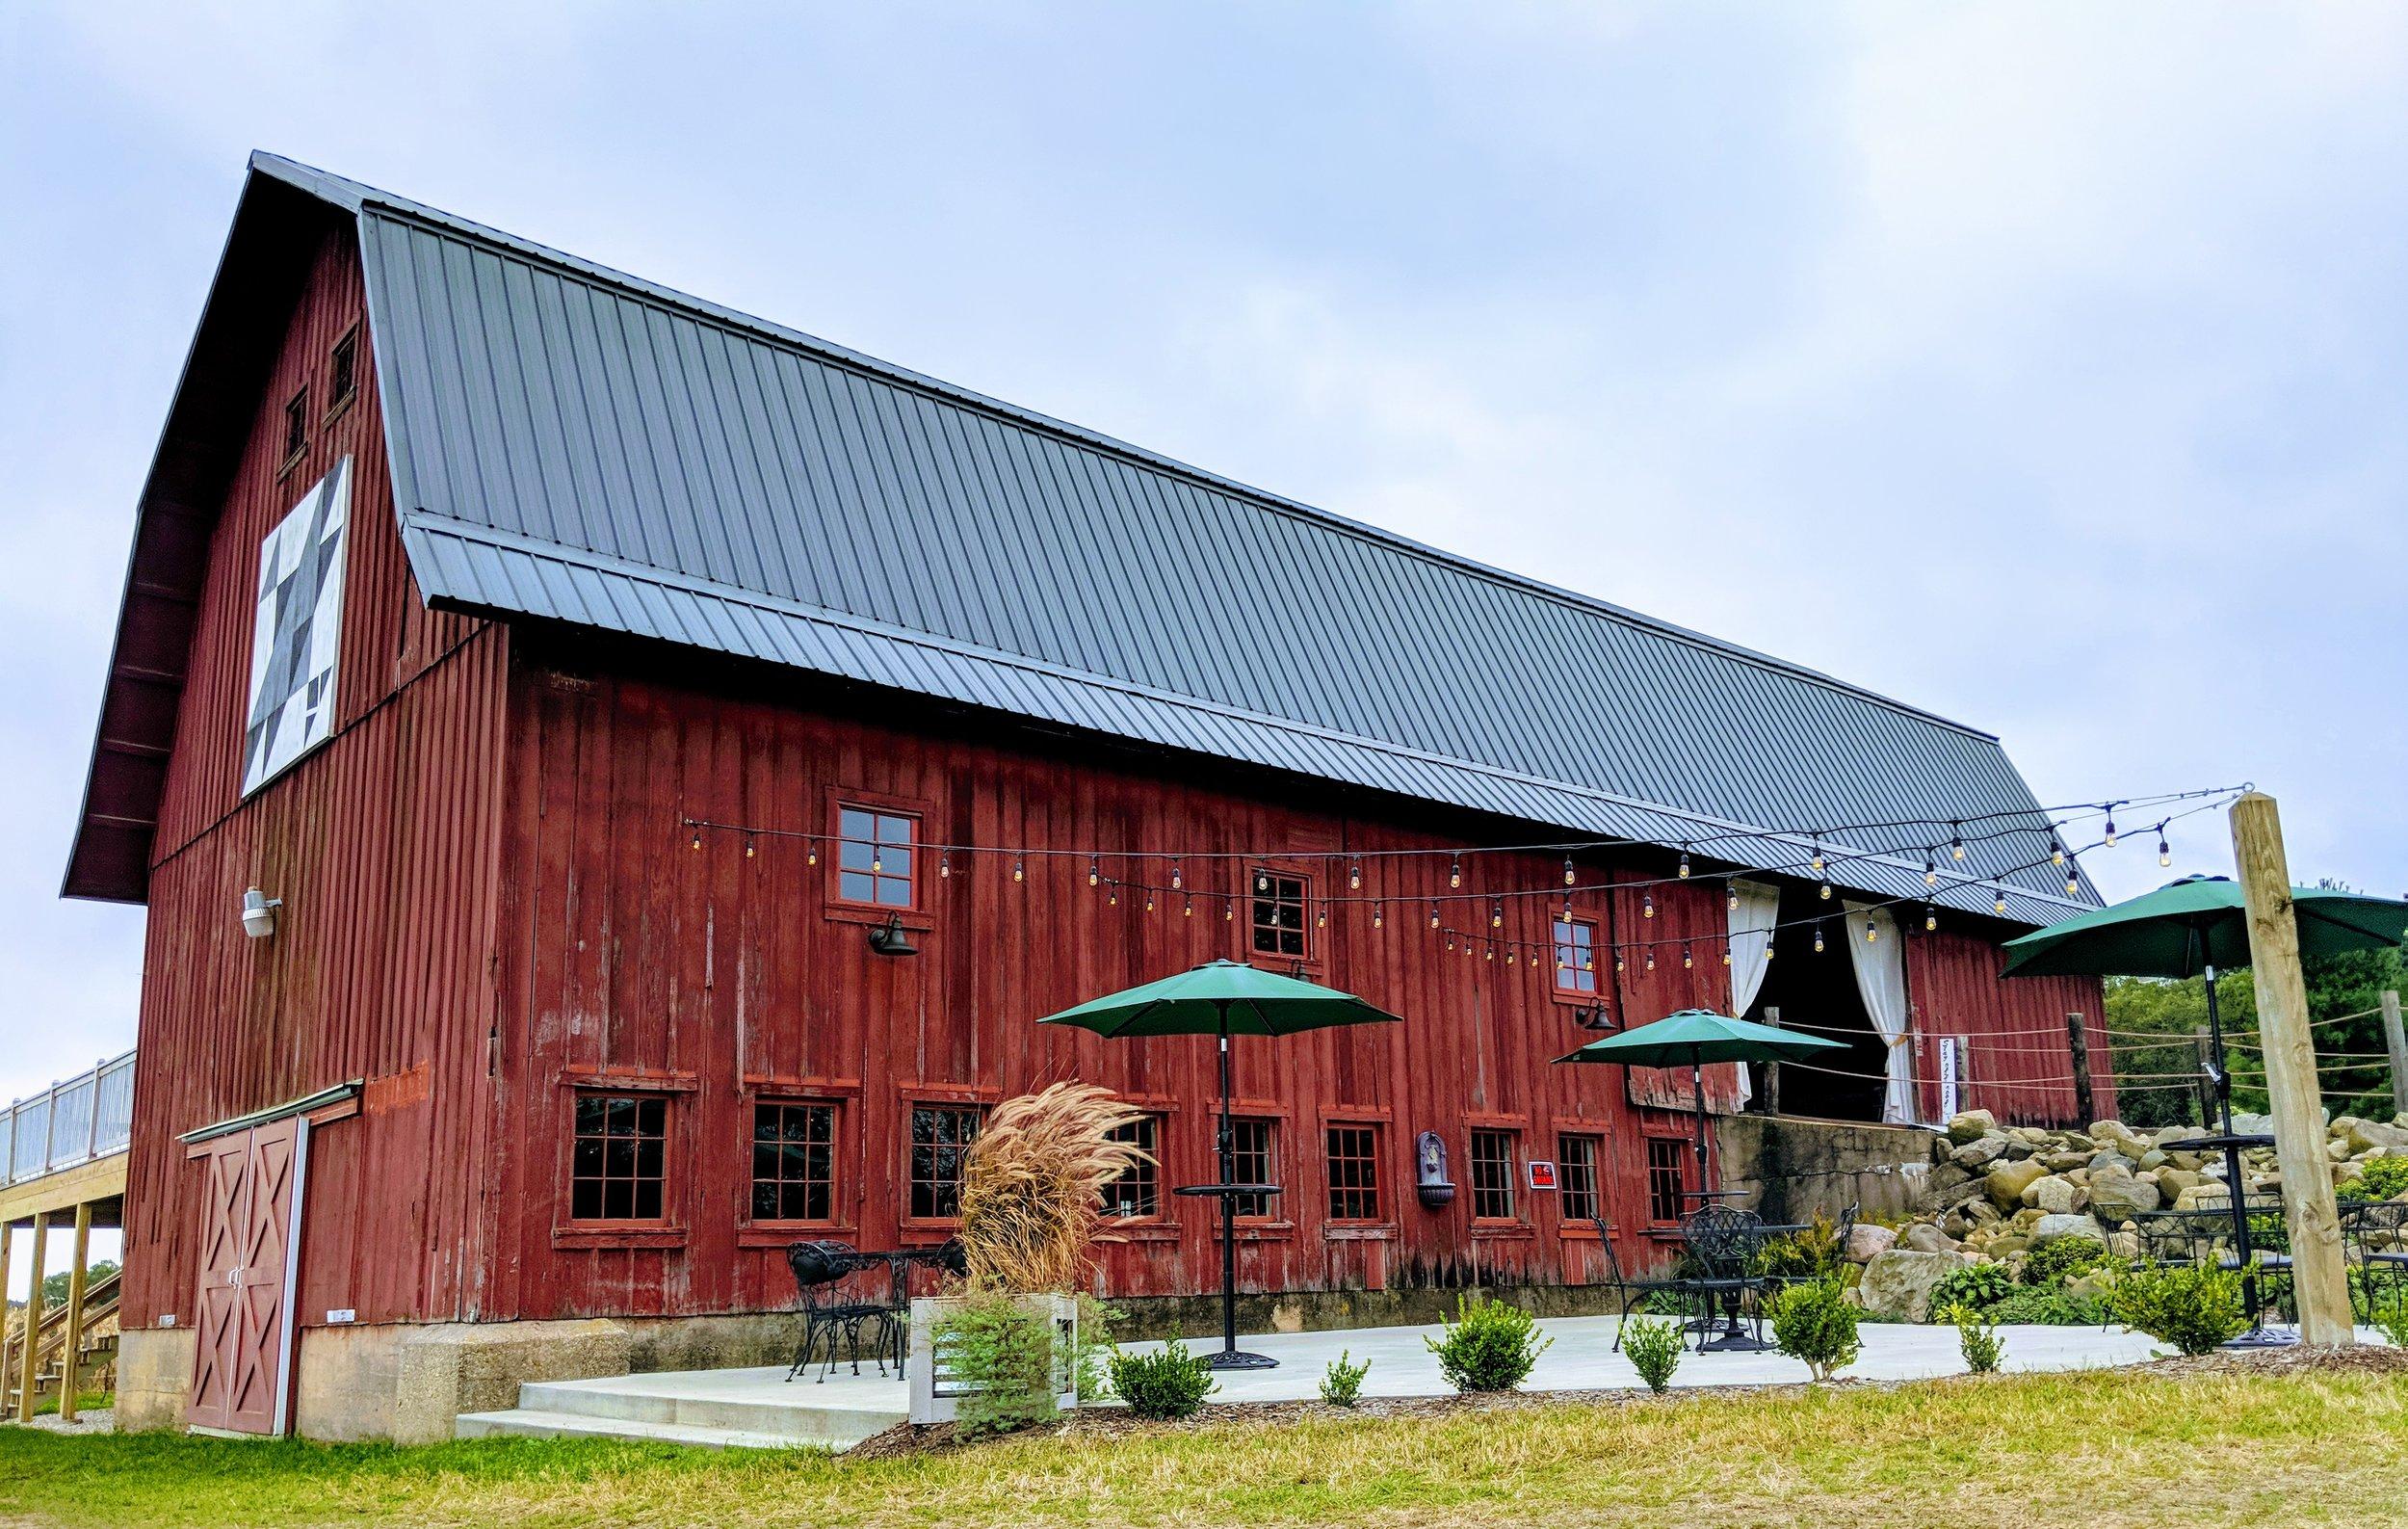 The Barn at Back Acres Farm - Southeastern Wisconsin Wedding Venue - Outdoor Patio